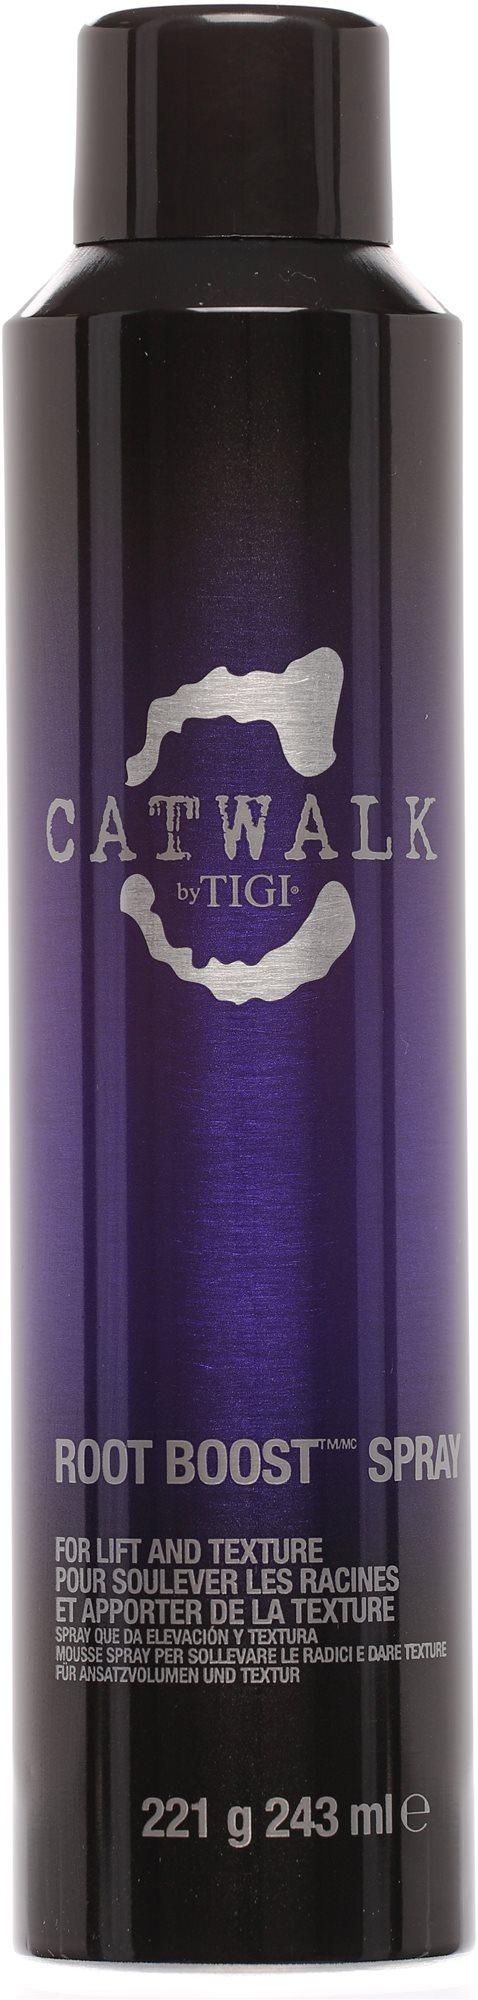 TIGI Catwalk Root Boost-Spray, 243 ml